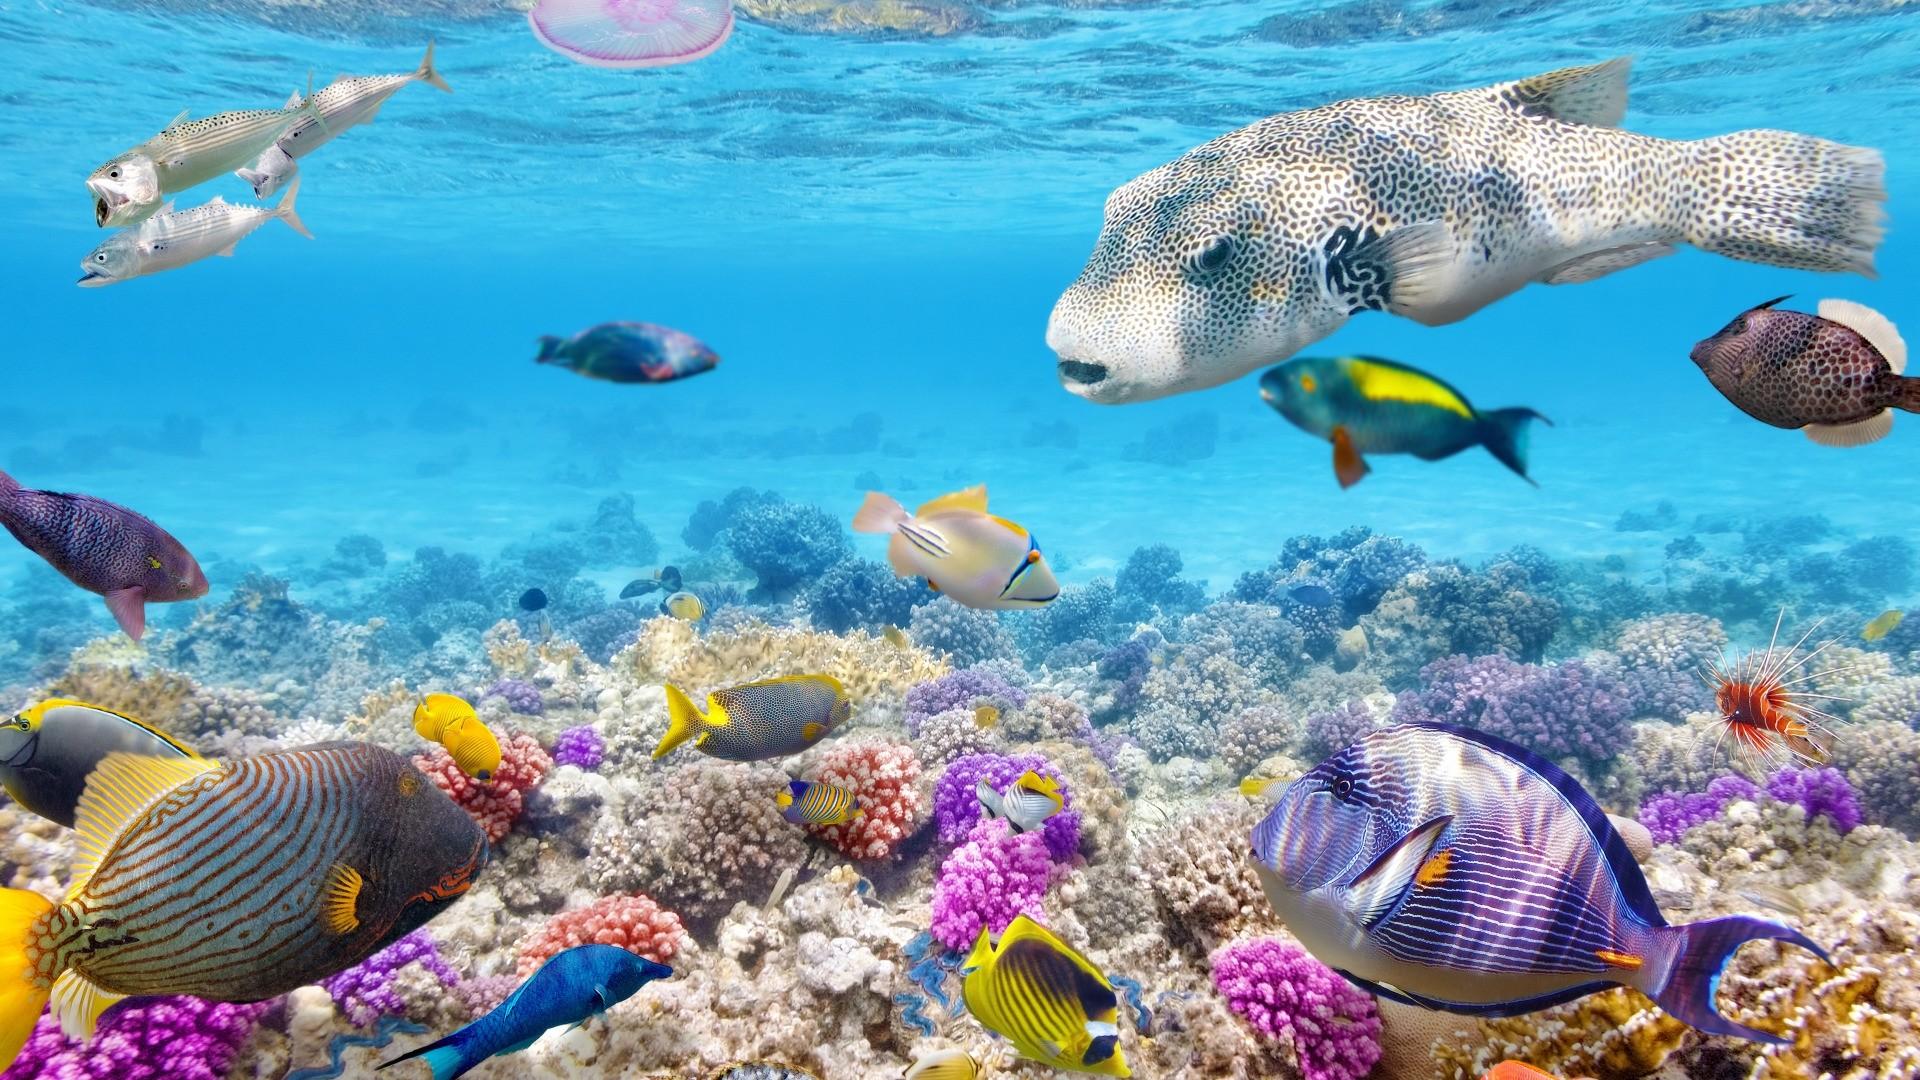 Coral Reef Free Wallpaper